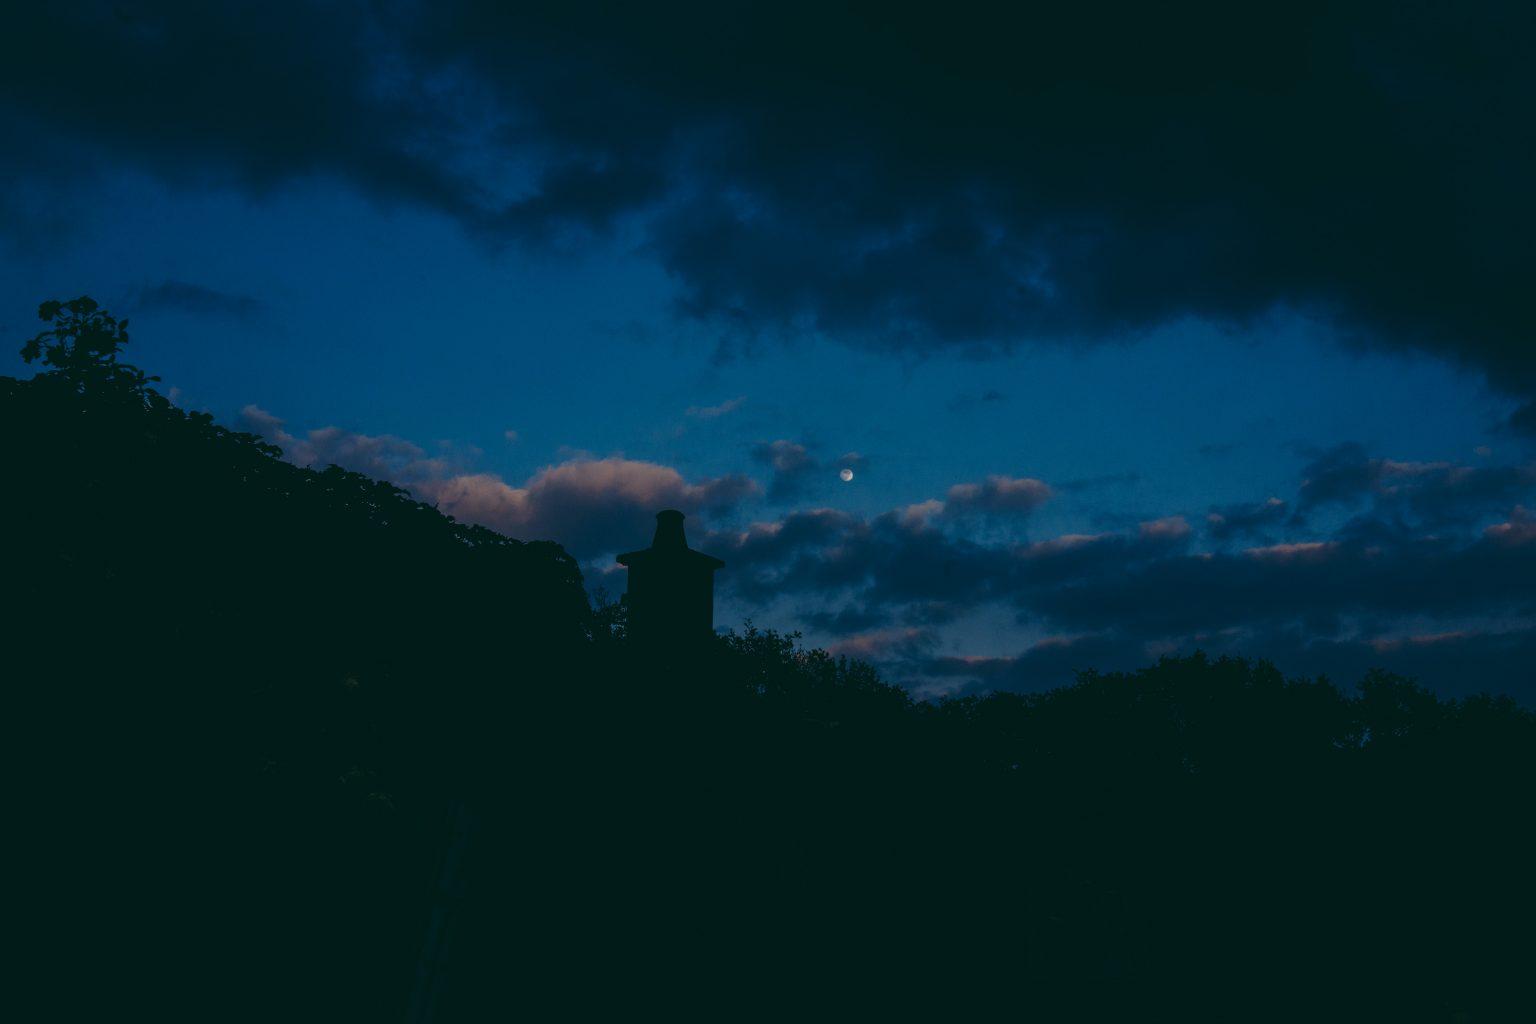 Bonneuil-Matours, France, May 2017 - La Maison Neuve. The former house of Tristan Plot in the night. >< Bonneuil-Matours, Francia, maggio 2017 - La vecchia casa di Tristan Plot nella notte.*** SPECIAL   FEE   APPLIES ***